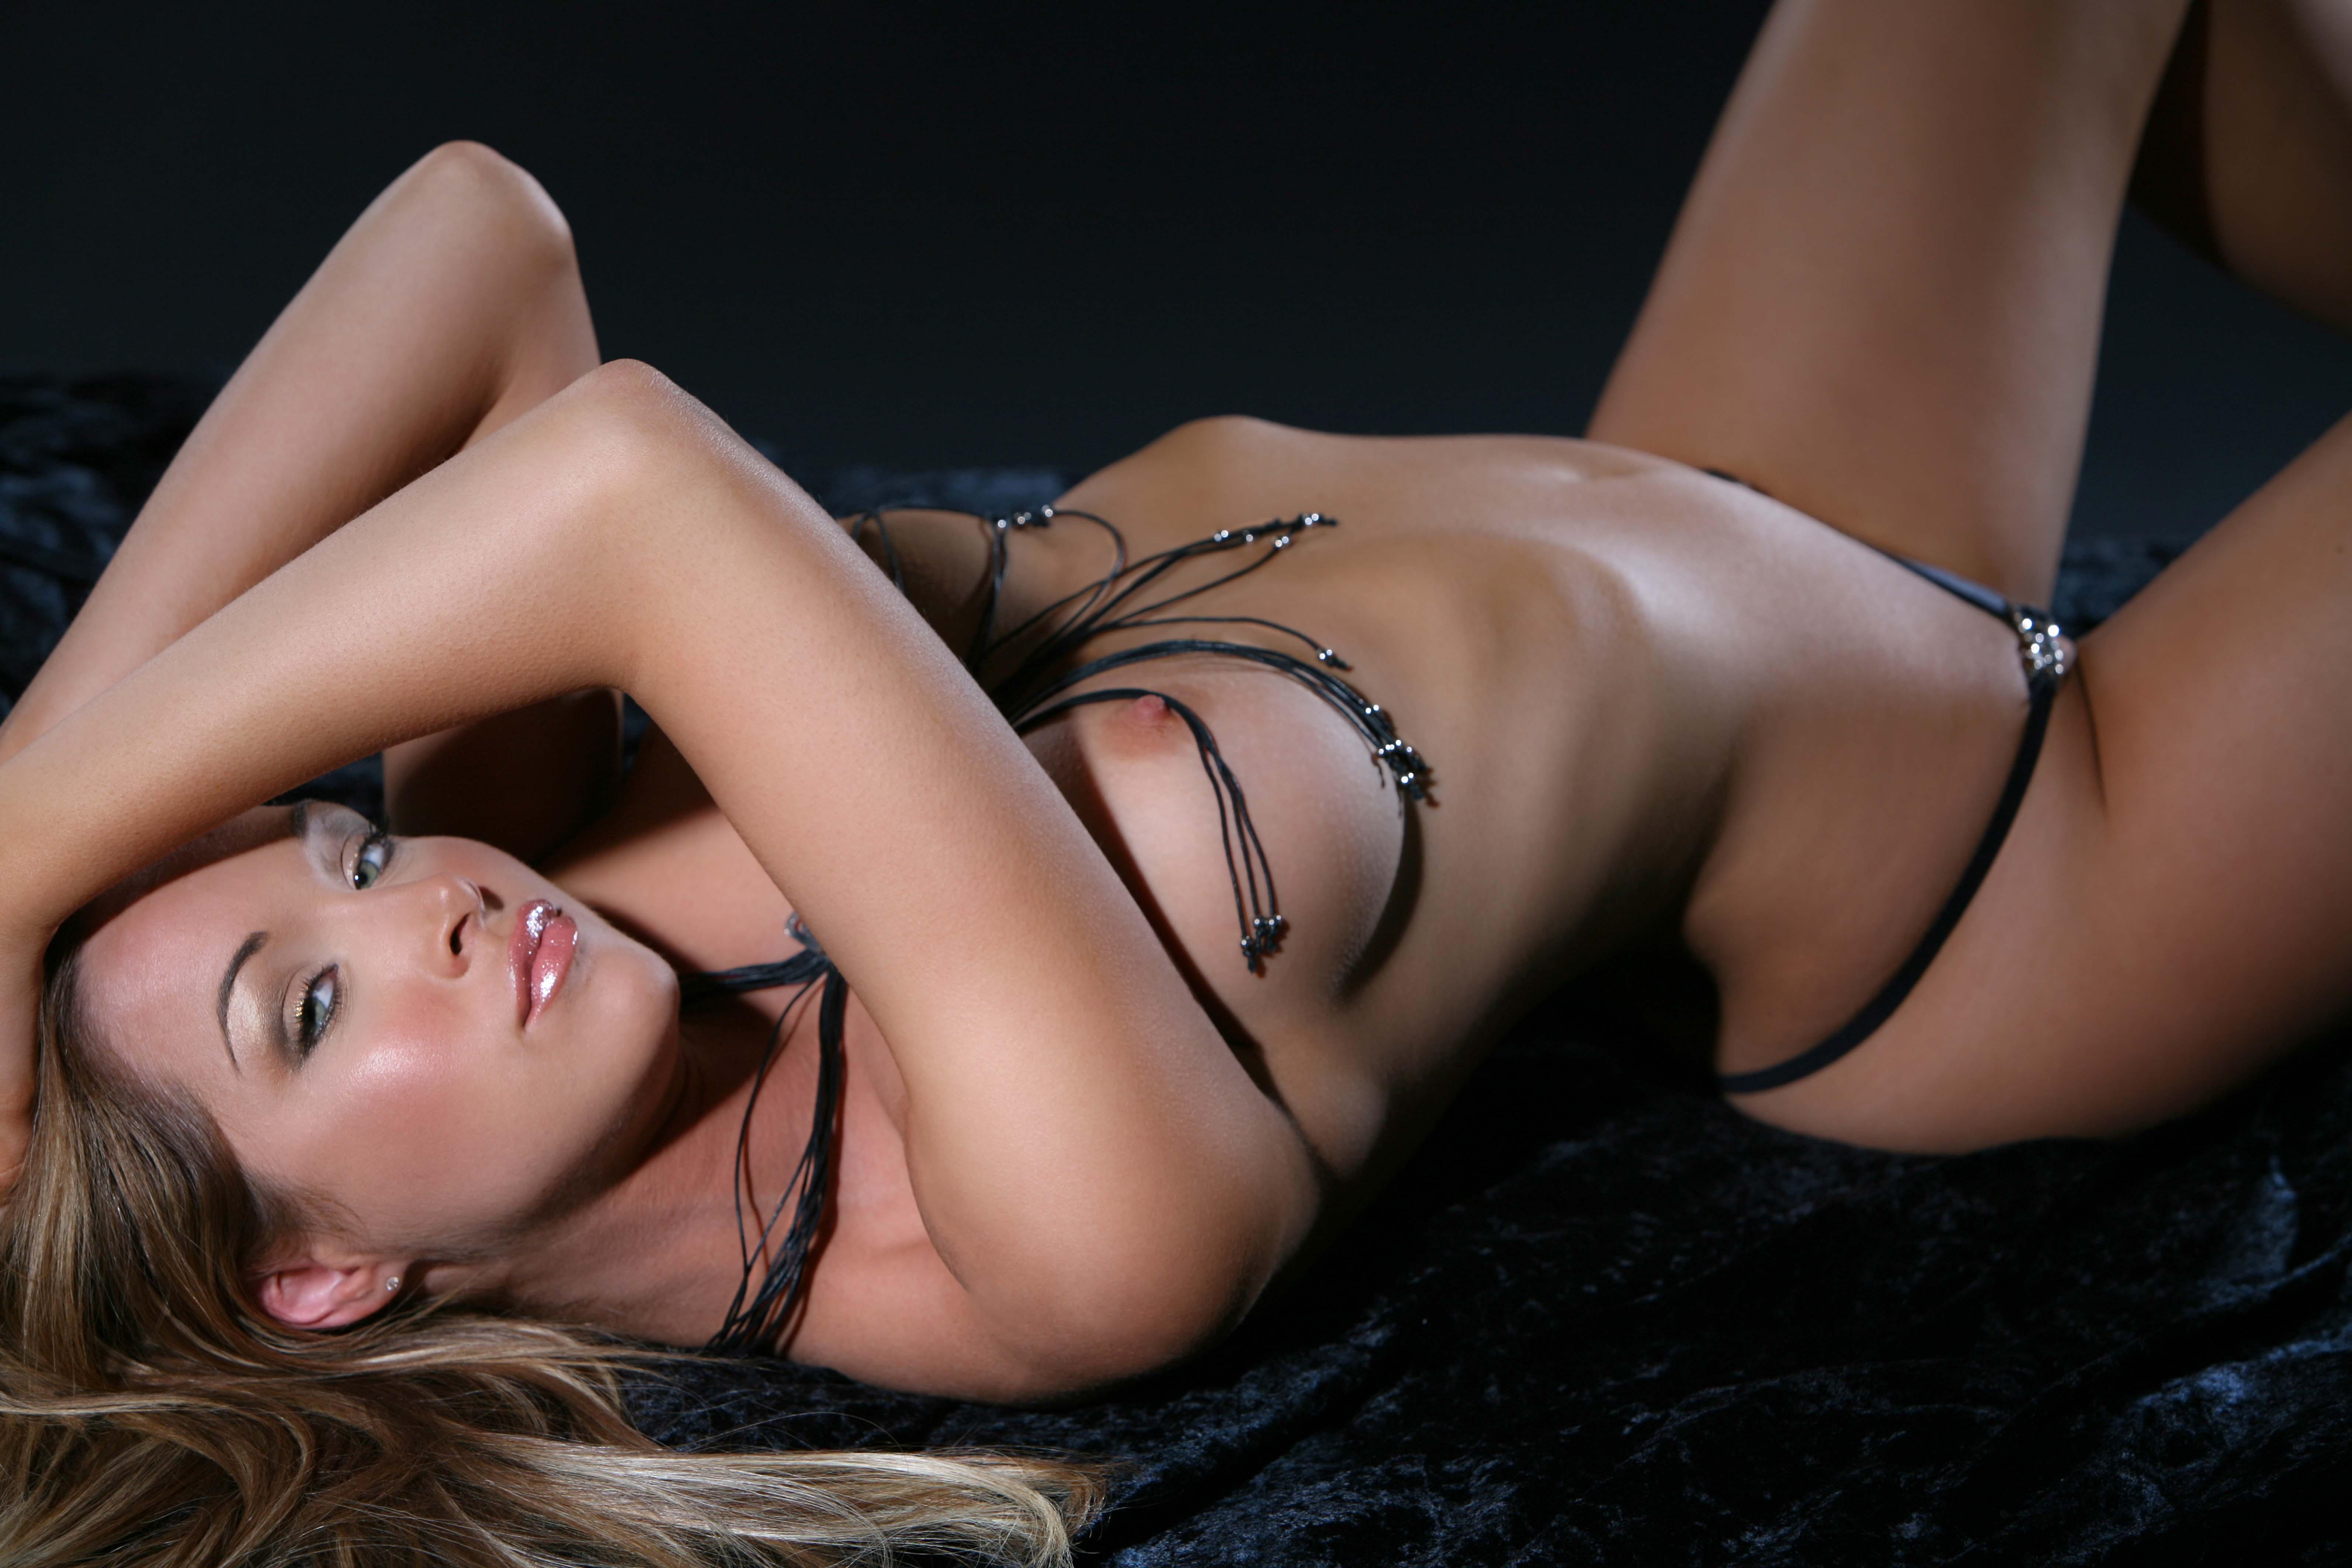 emily scott naked pics